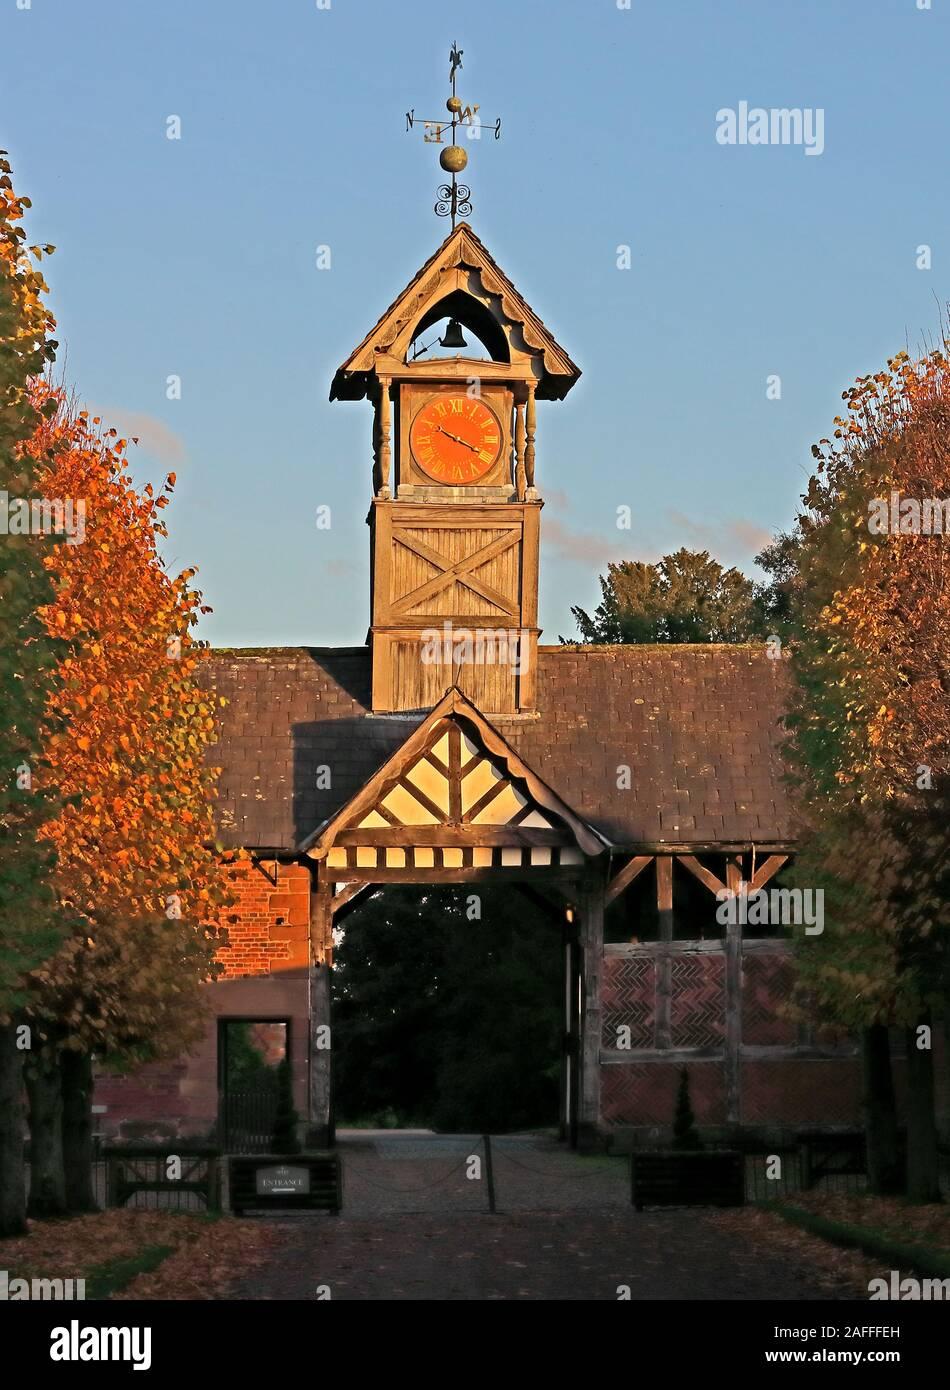 HotpixUK,GoTonySmith,CW9,Back Ln,Northwich,Cheshire,England,UK,CW9 6NA,Hall,village,time,timepiece,@HotpixUK,Viscount Ashbrook,autumn,canopy,19th century,arley hall,wooden clocktower,wooden clock tower,Arley Hall and Gardens,Arley Hall Gardens,country house,stately home,Cruck Barn